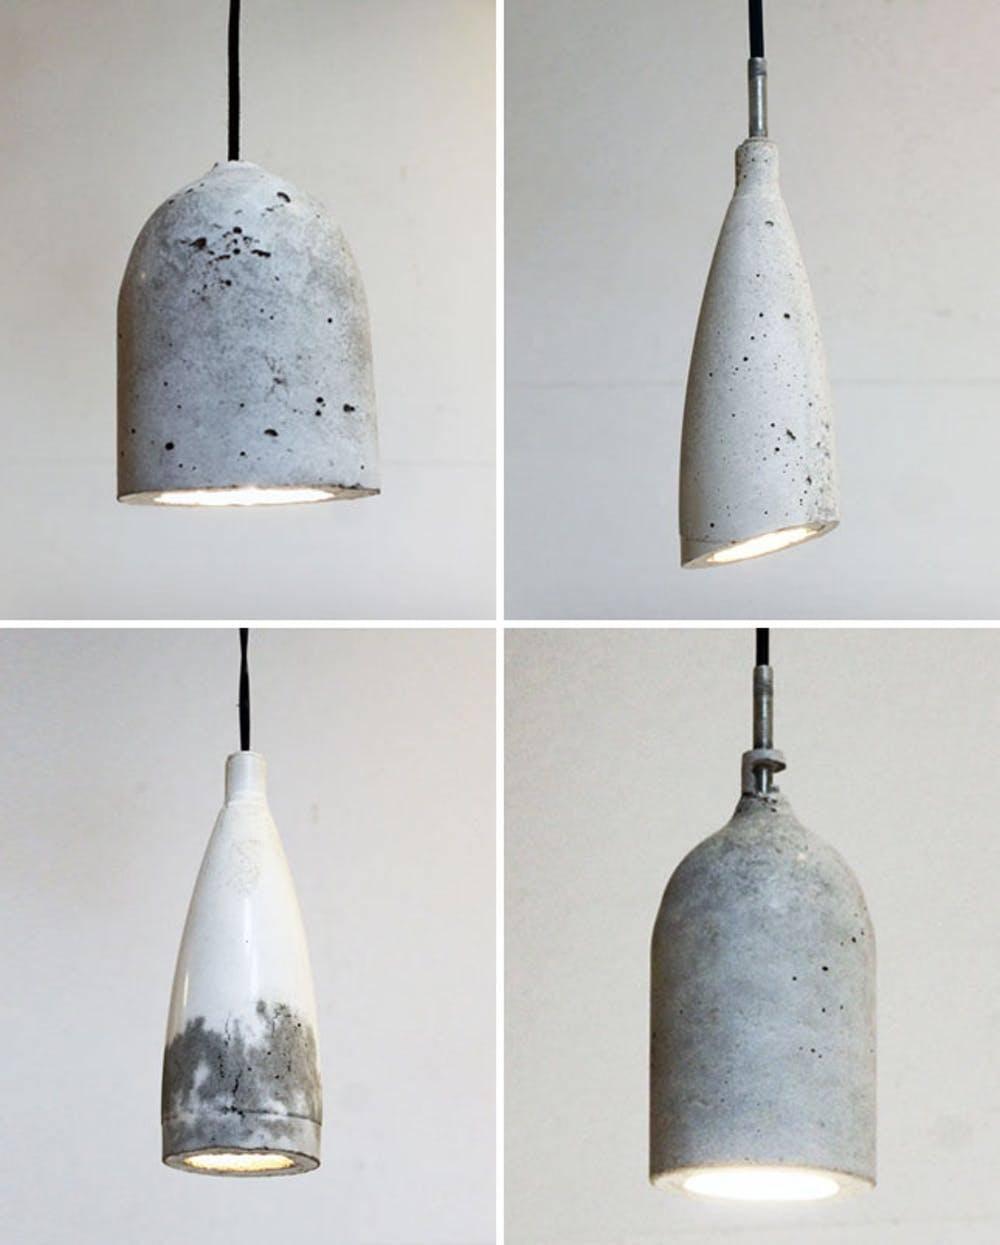 Repurpose Old Bottles Into Pendant Light Fixture Molds Tutorial On Homemade Modern